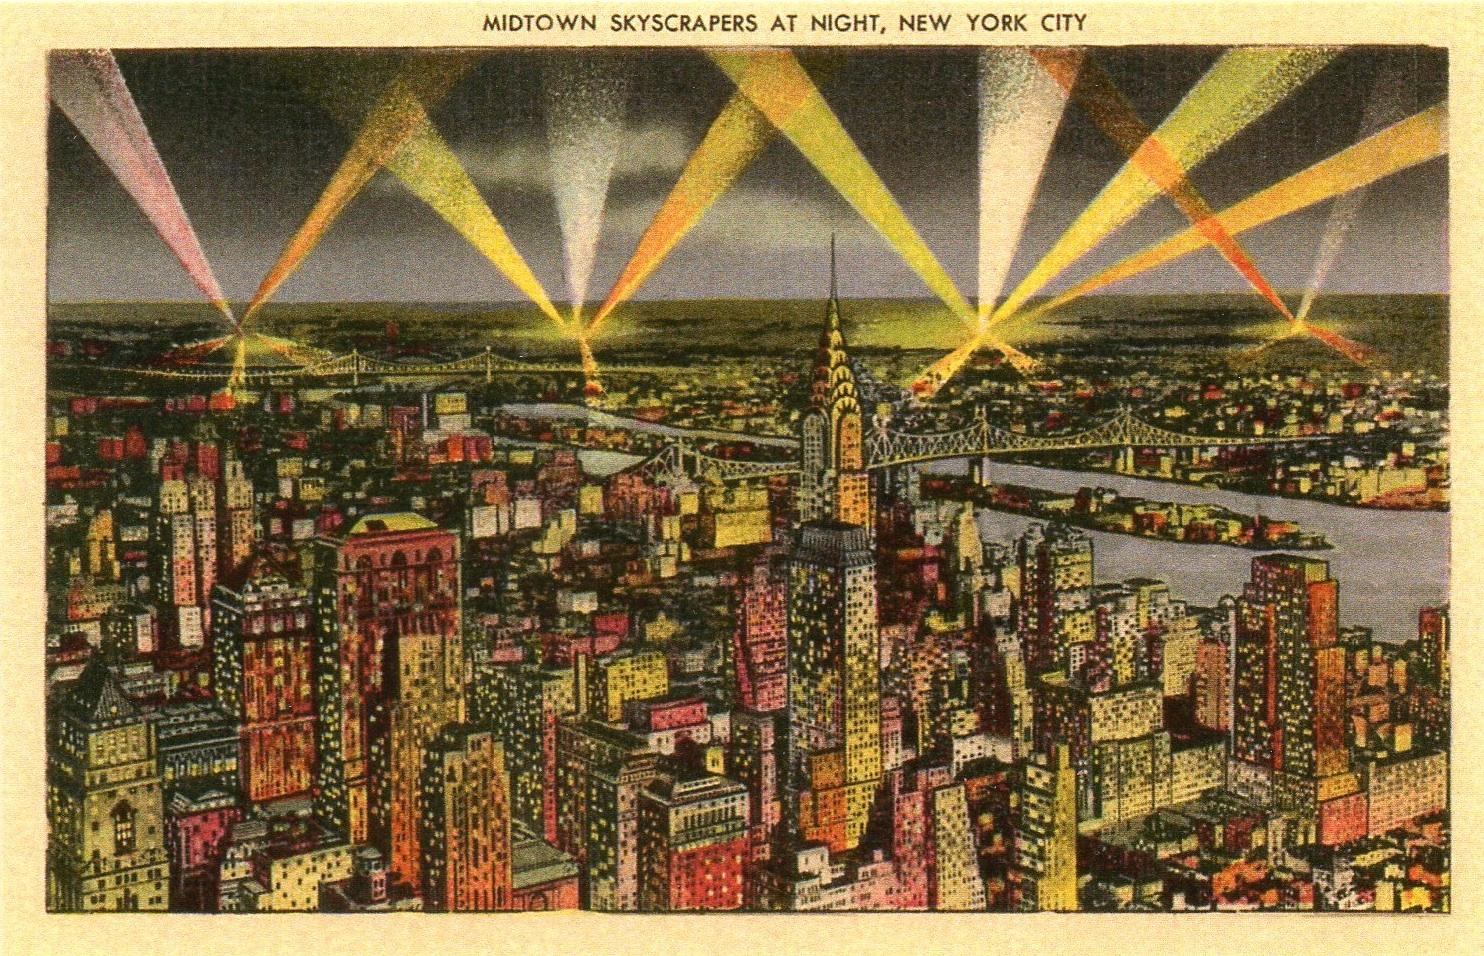 http://3.bp.blogspot.com/-OAW44CoS-dw/UFNbpHZVsiI/AAAAAAAANfk/eC5Ldmup_6o/s1600/newyorkspotlightscard.jpg